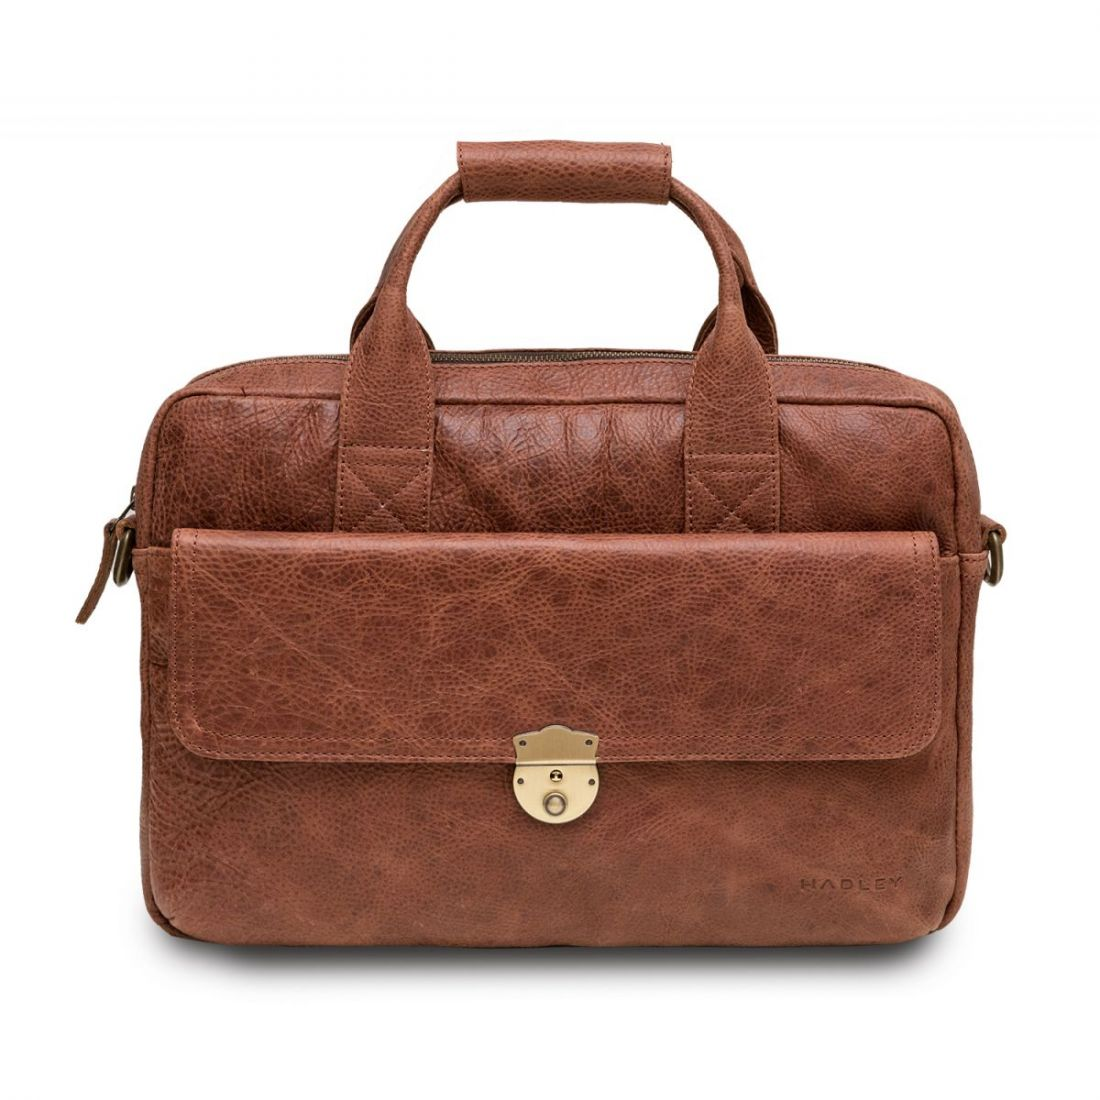 HADLEY MAPLE SMOKY RED кожаный портфель